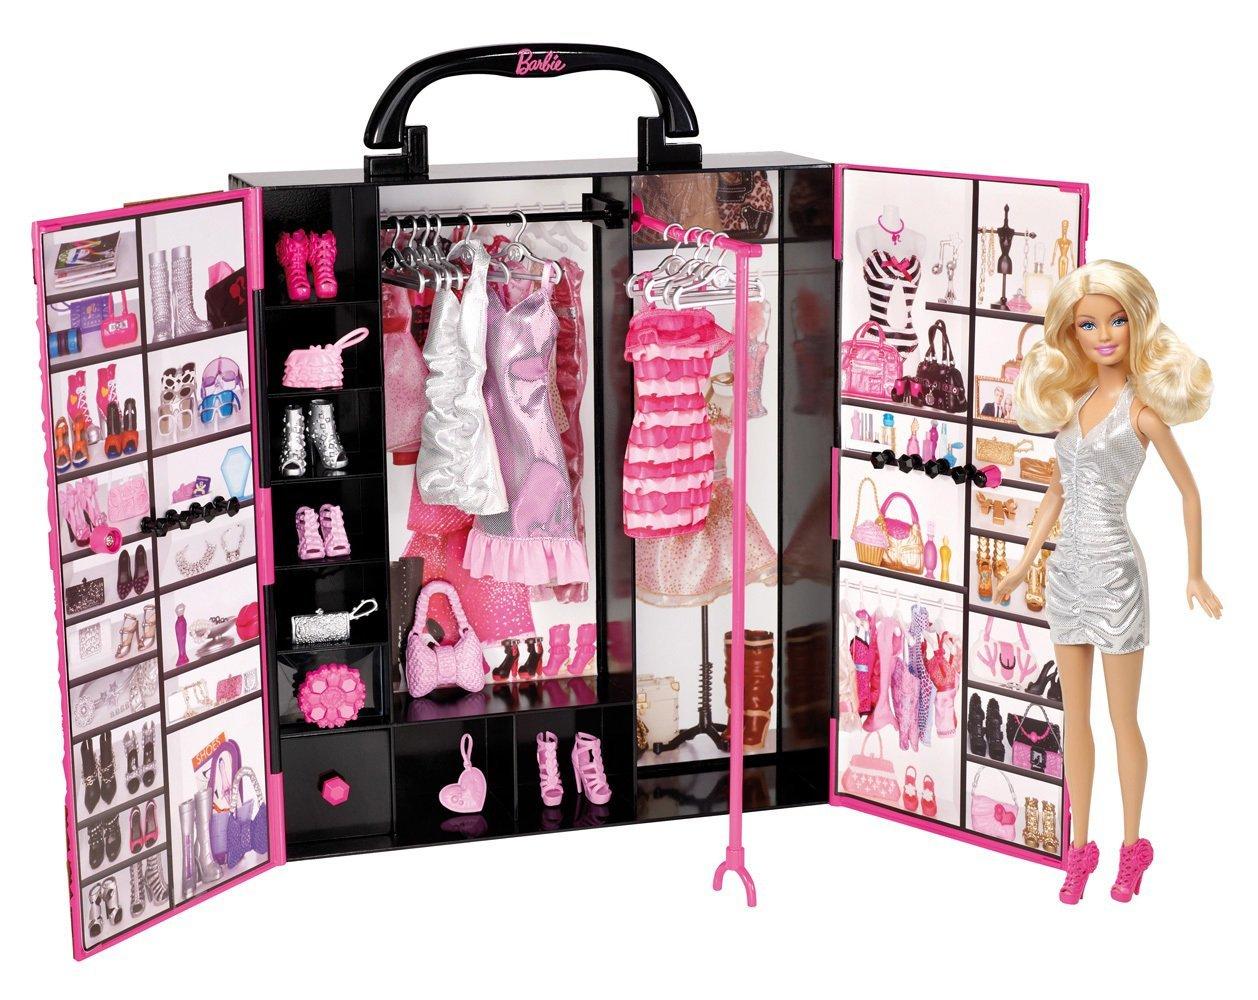 Barbie Fashionista Ultimate Closet